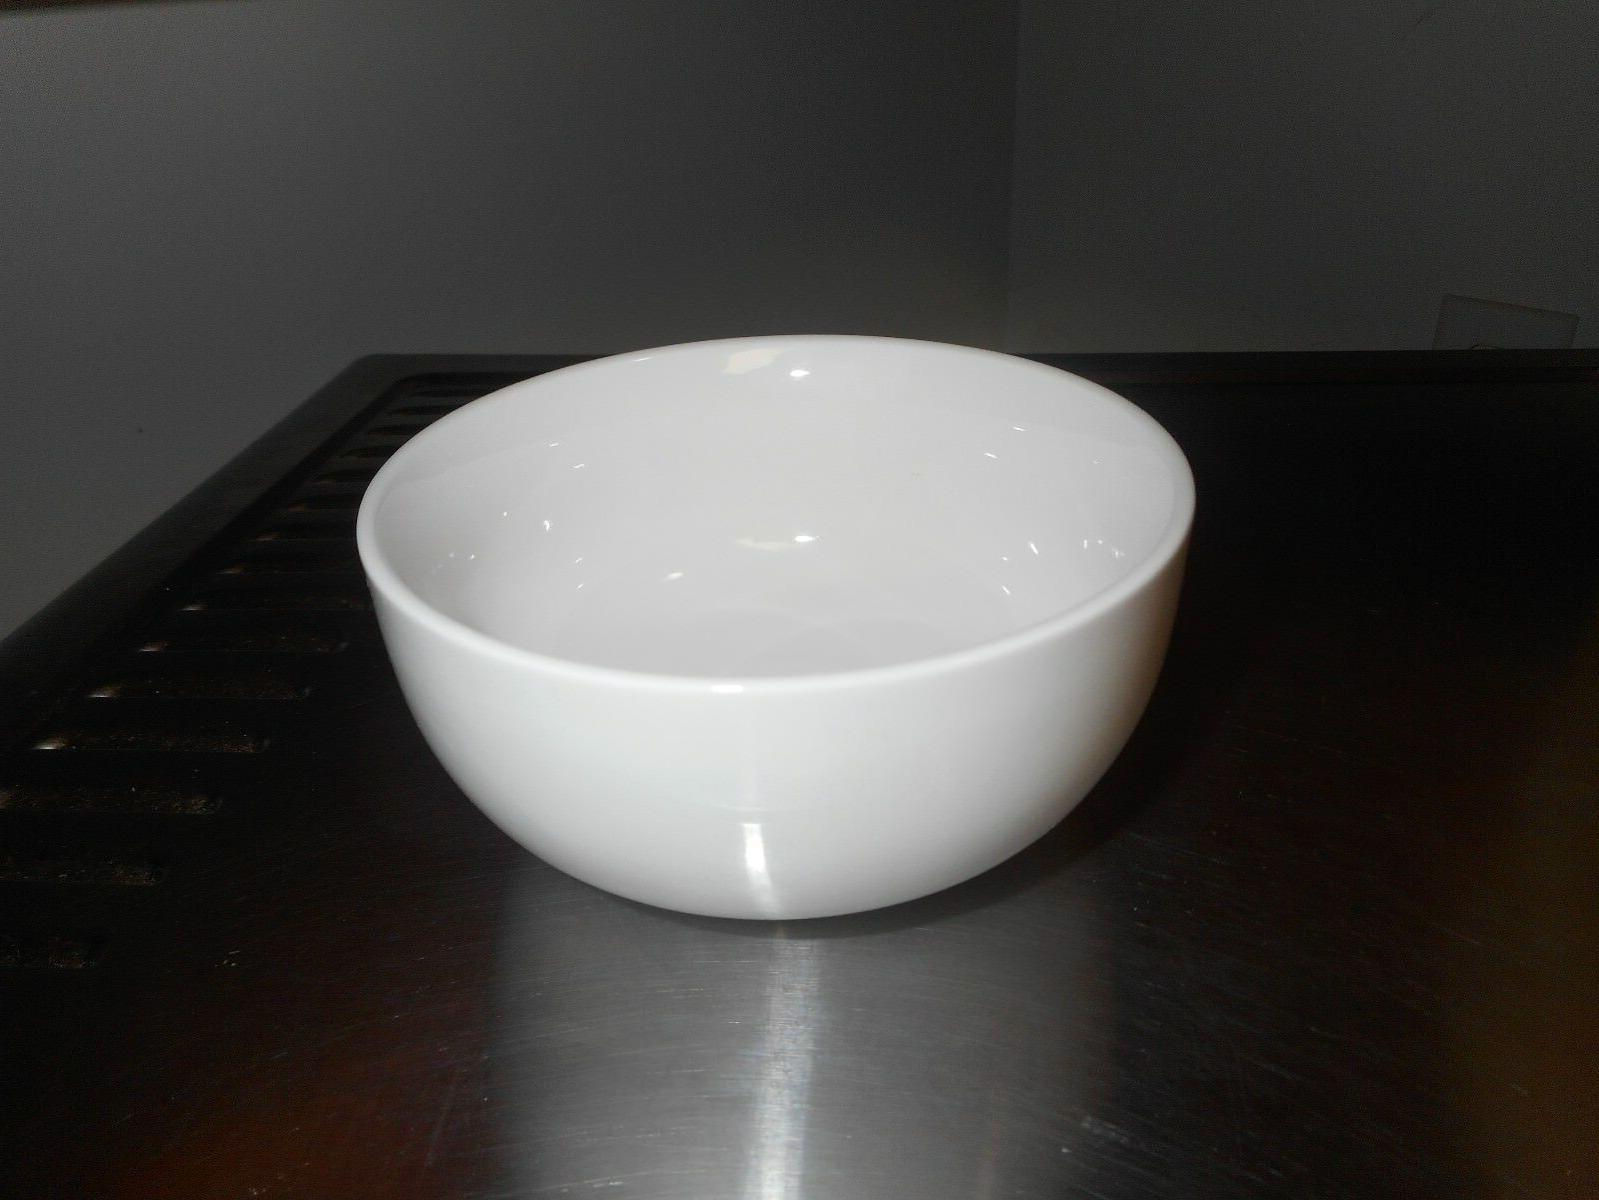 Oxford 6 12 - Quality Pure White